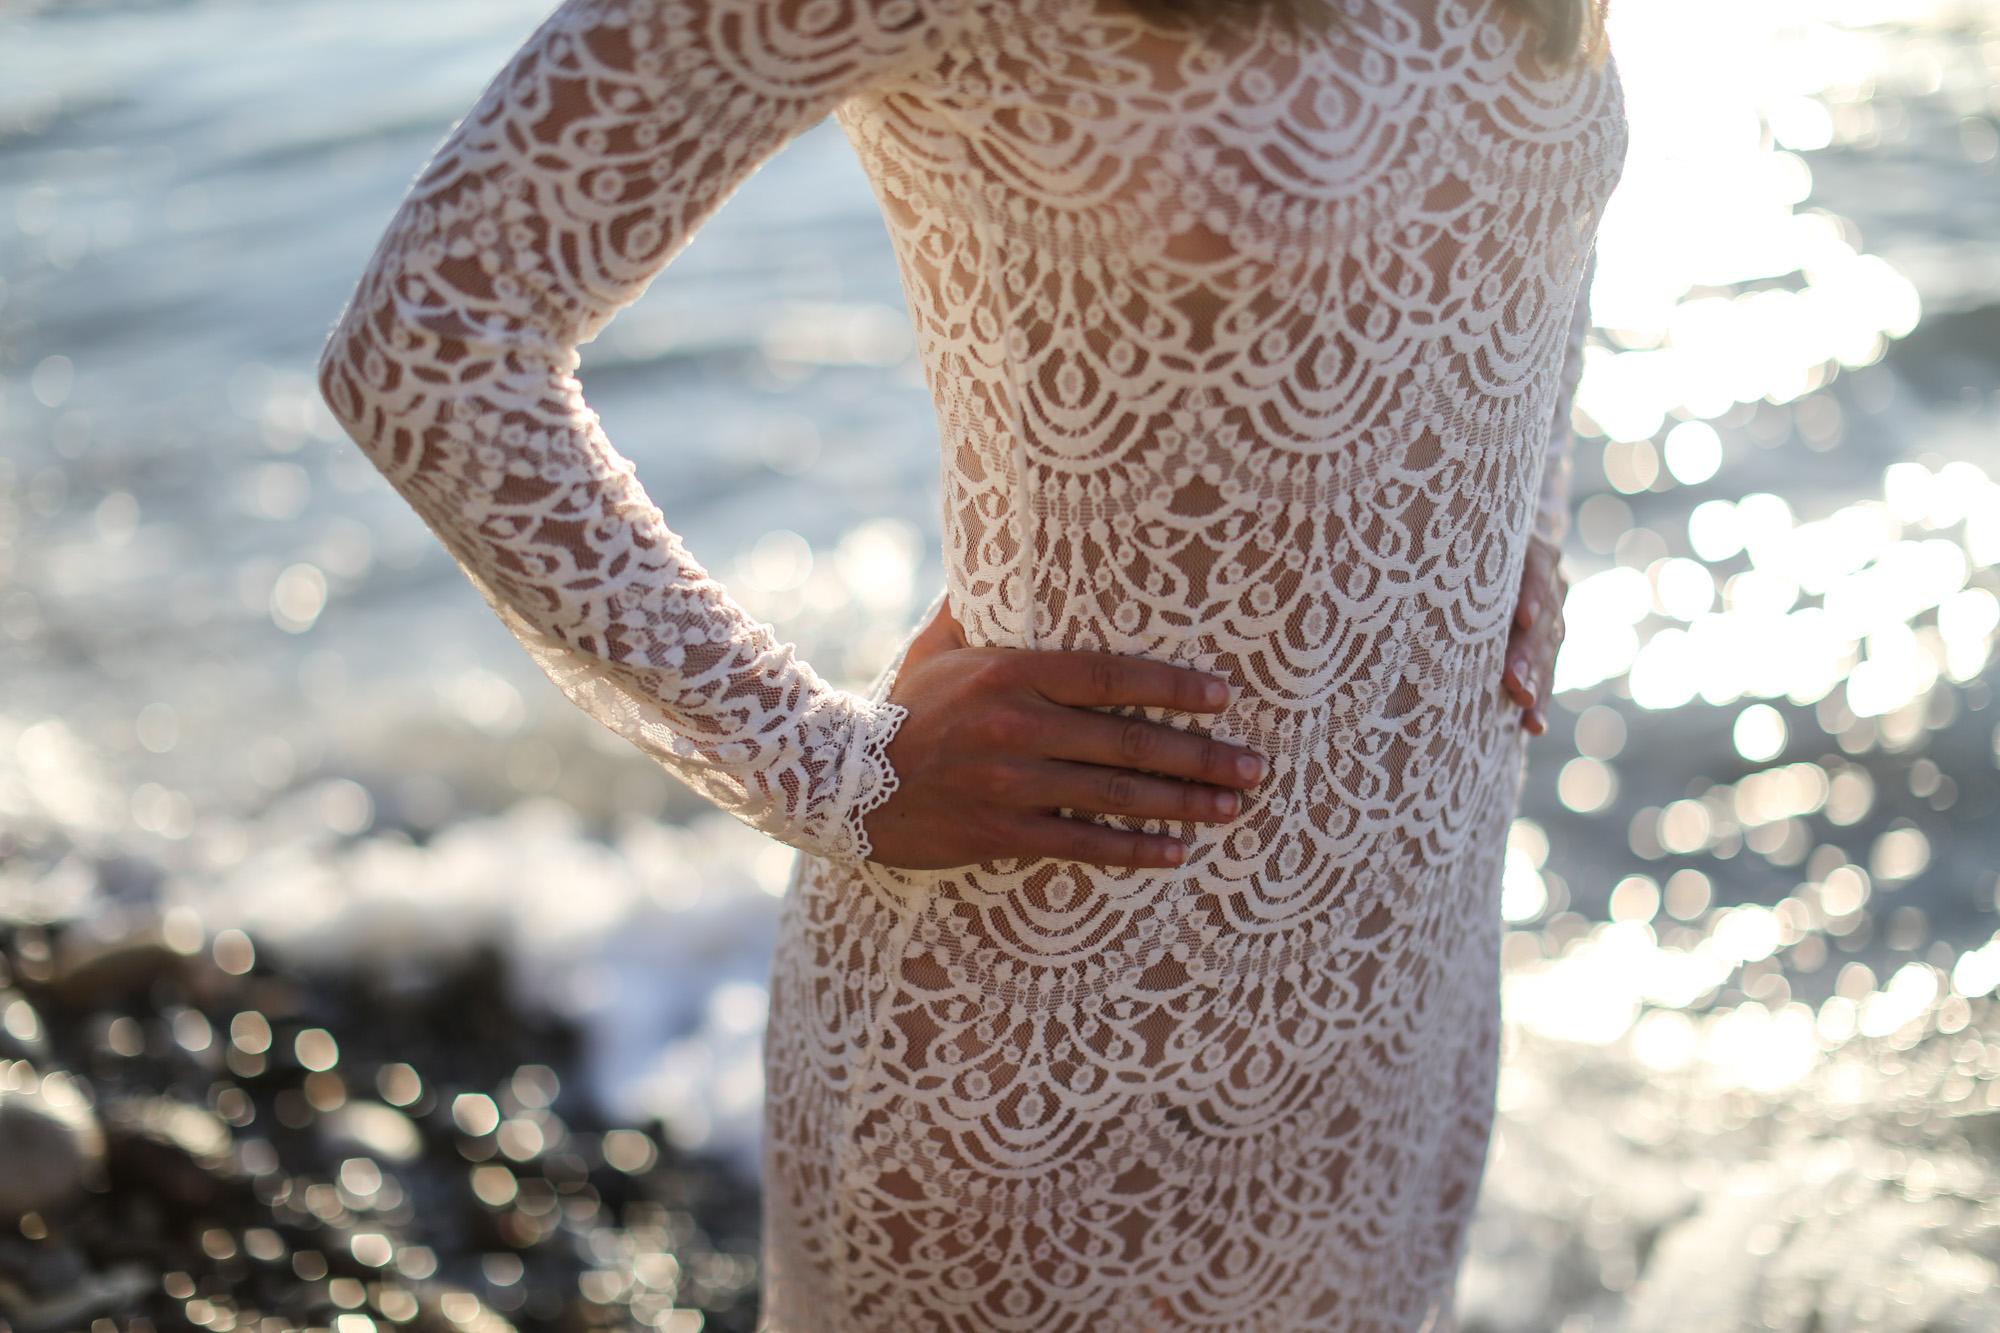 Clochet_streetstyle_long_white_lace_dress-13